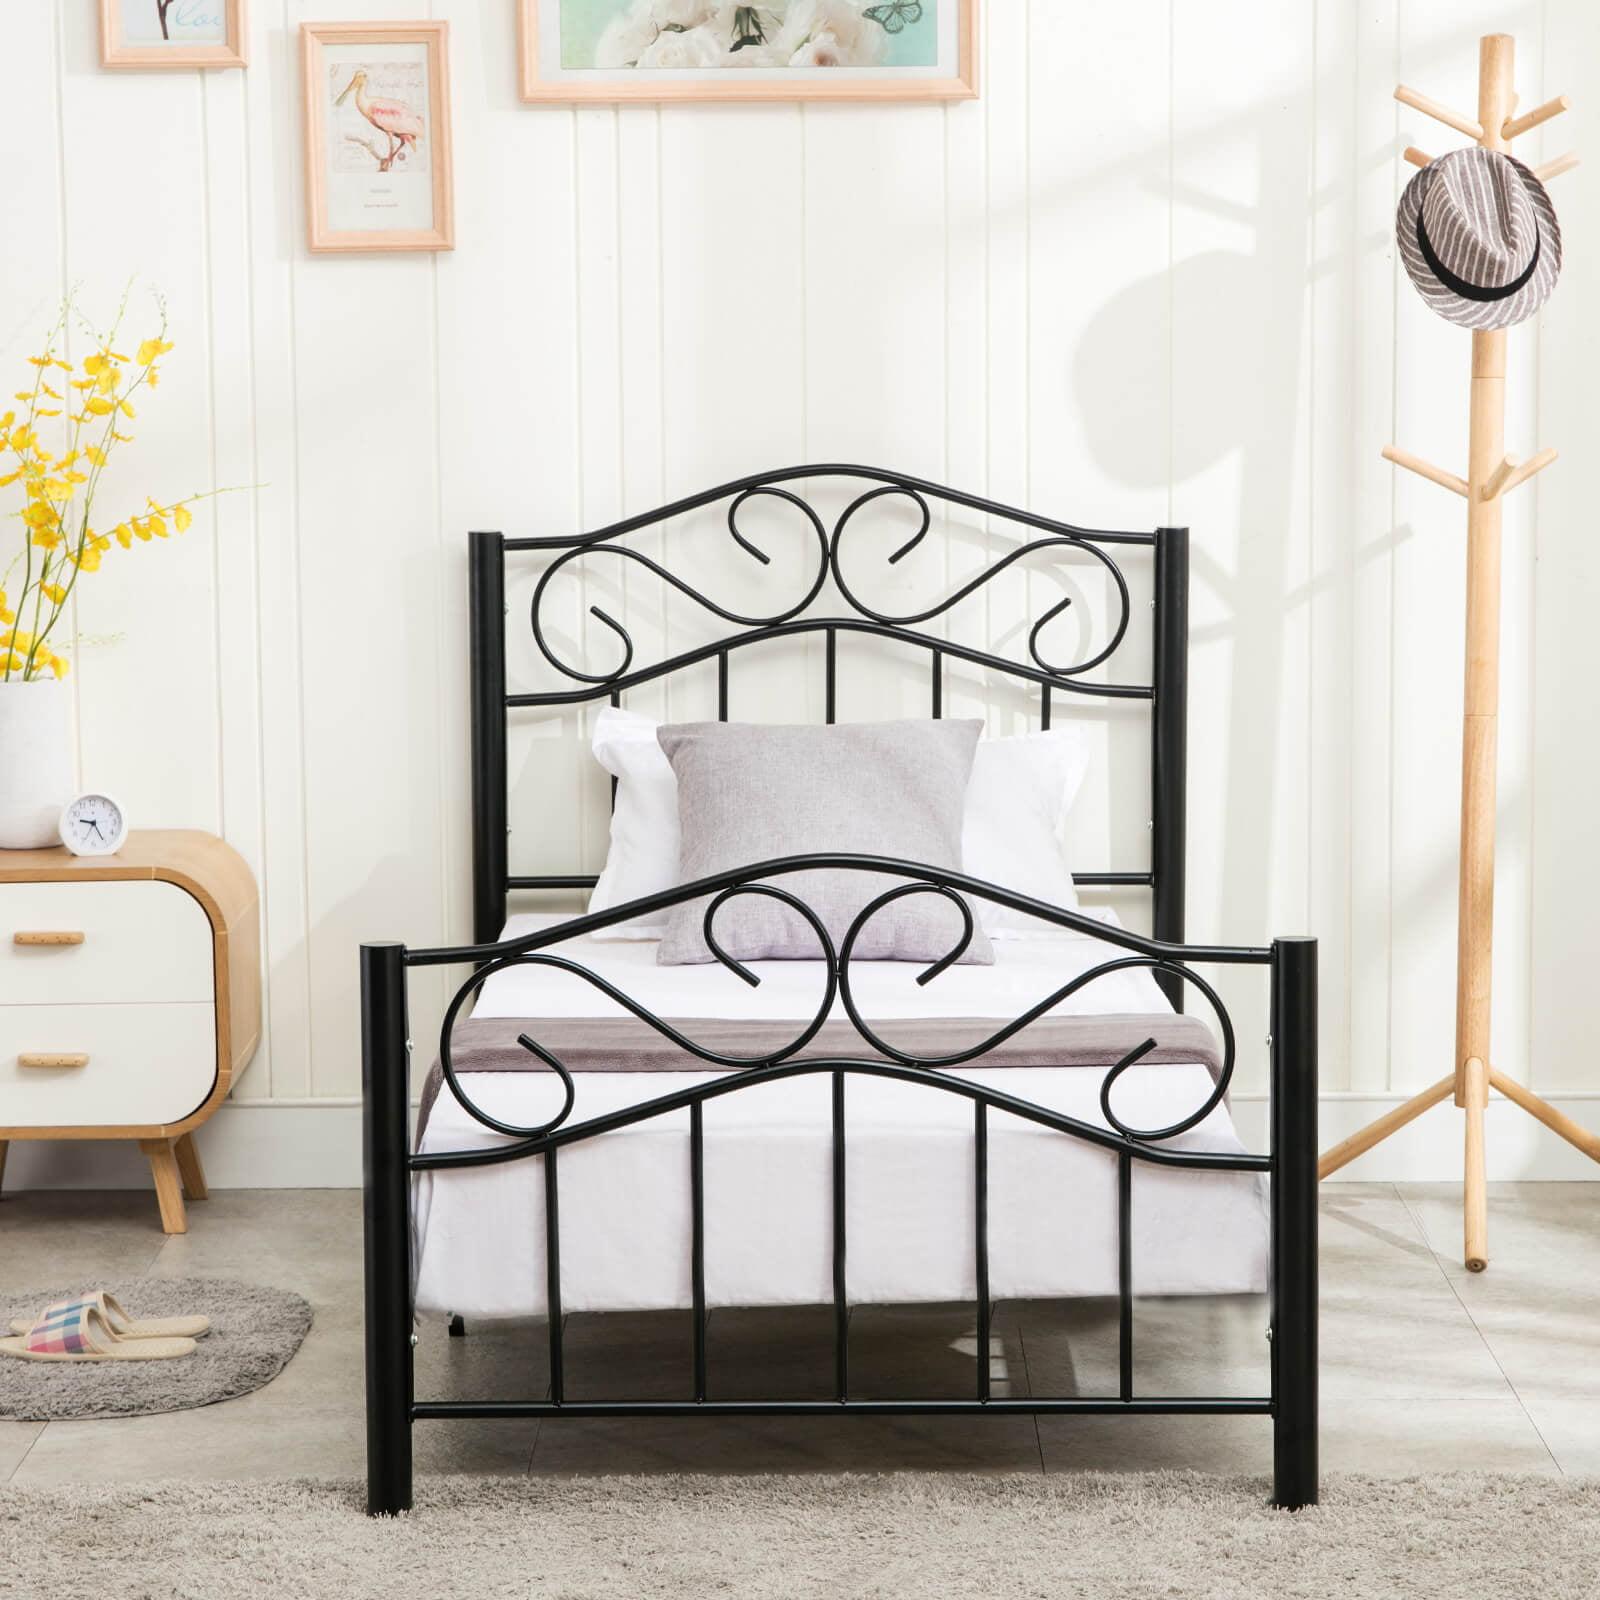 Mecor Bed Frame Twin Size Headboard Footboard Bedroom Steel Heavy Duty Metal Black Walmart Com Walmart Com